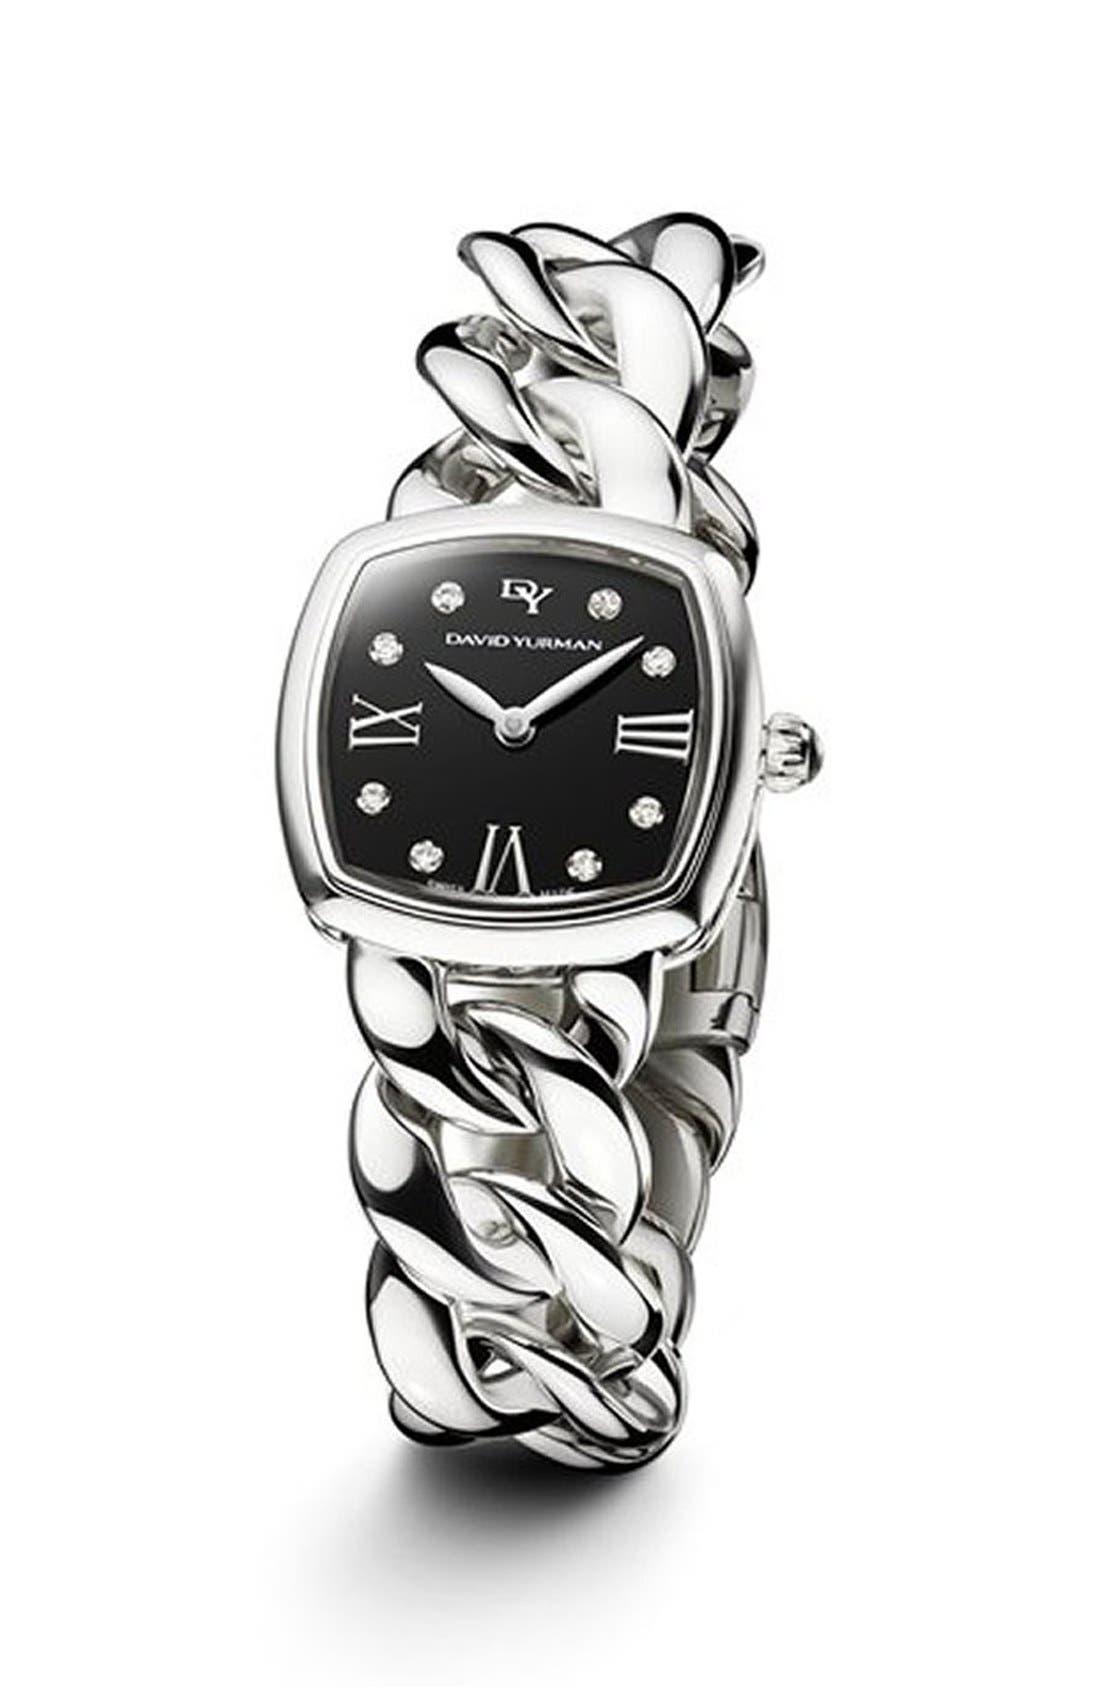 DAVID YURMAN Albion 23mm Stainless Steel Quartz Watch with Diamonds